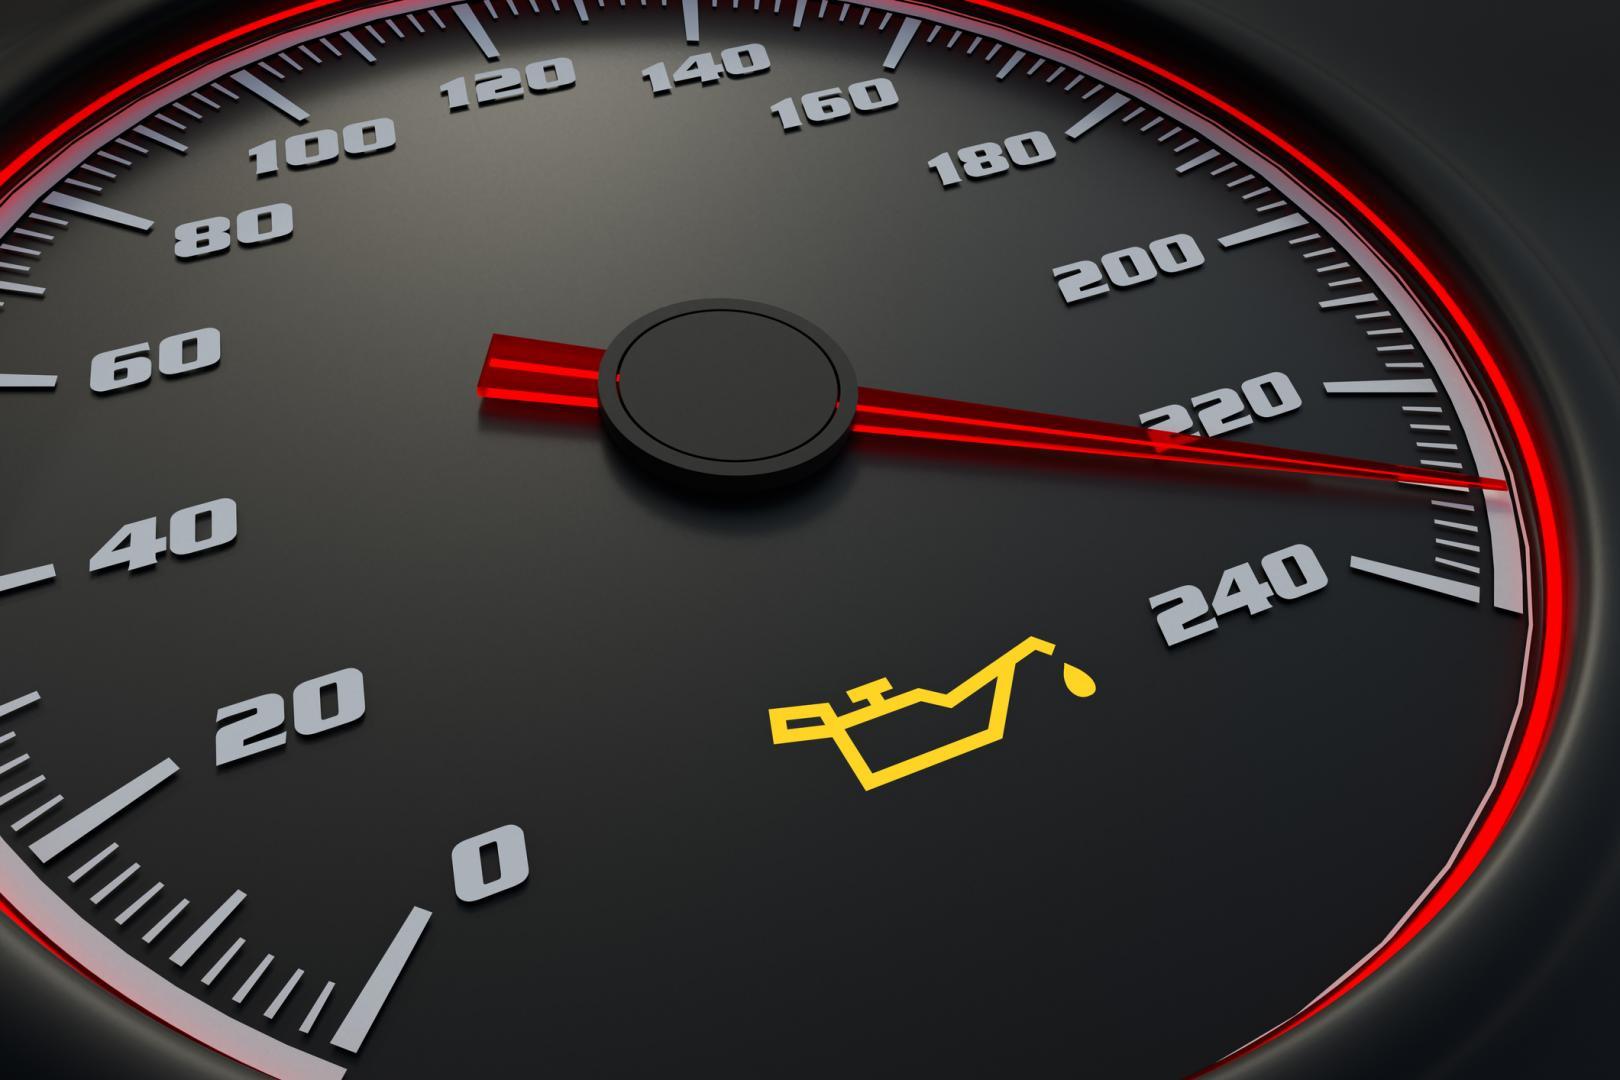 Oil light on car dashboard